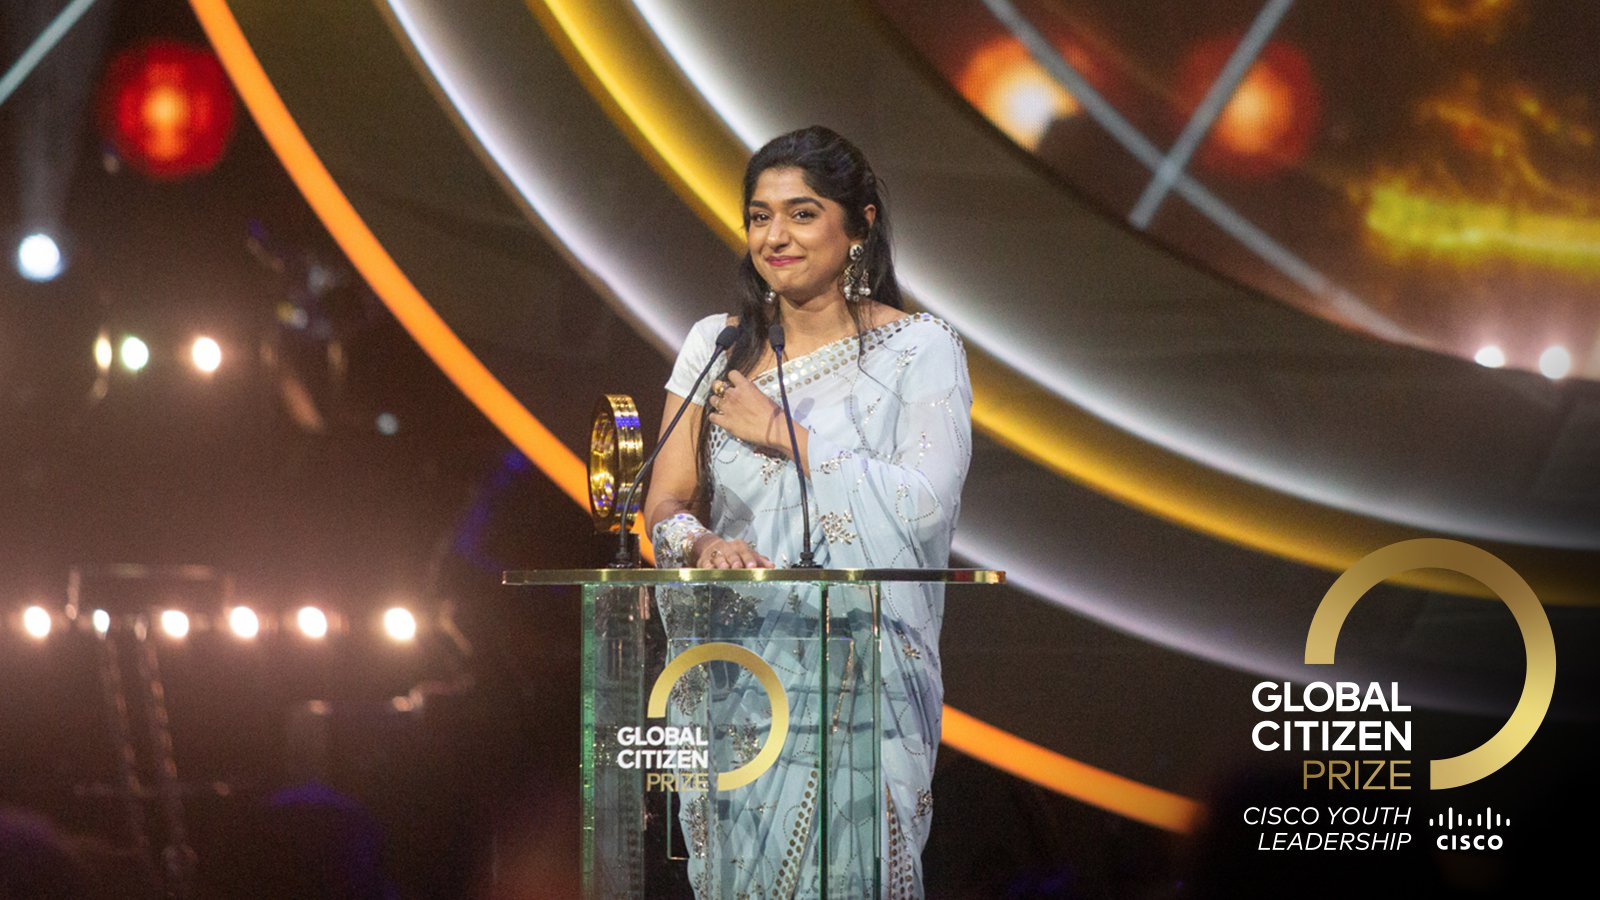 Global Citizen Prize: Cisco Youth Leadership Award 2020 (US$250,000 prize)